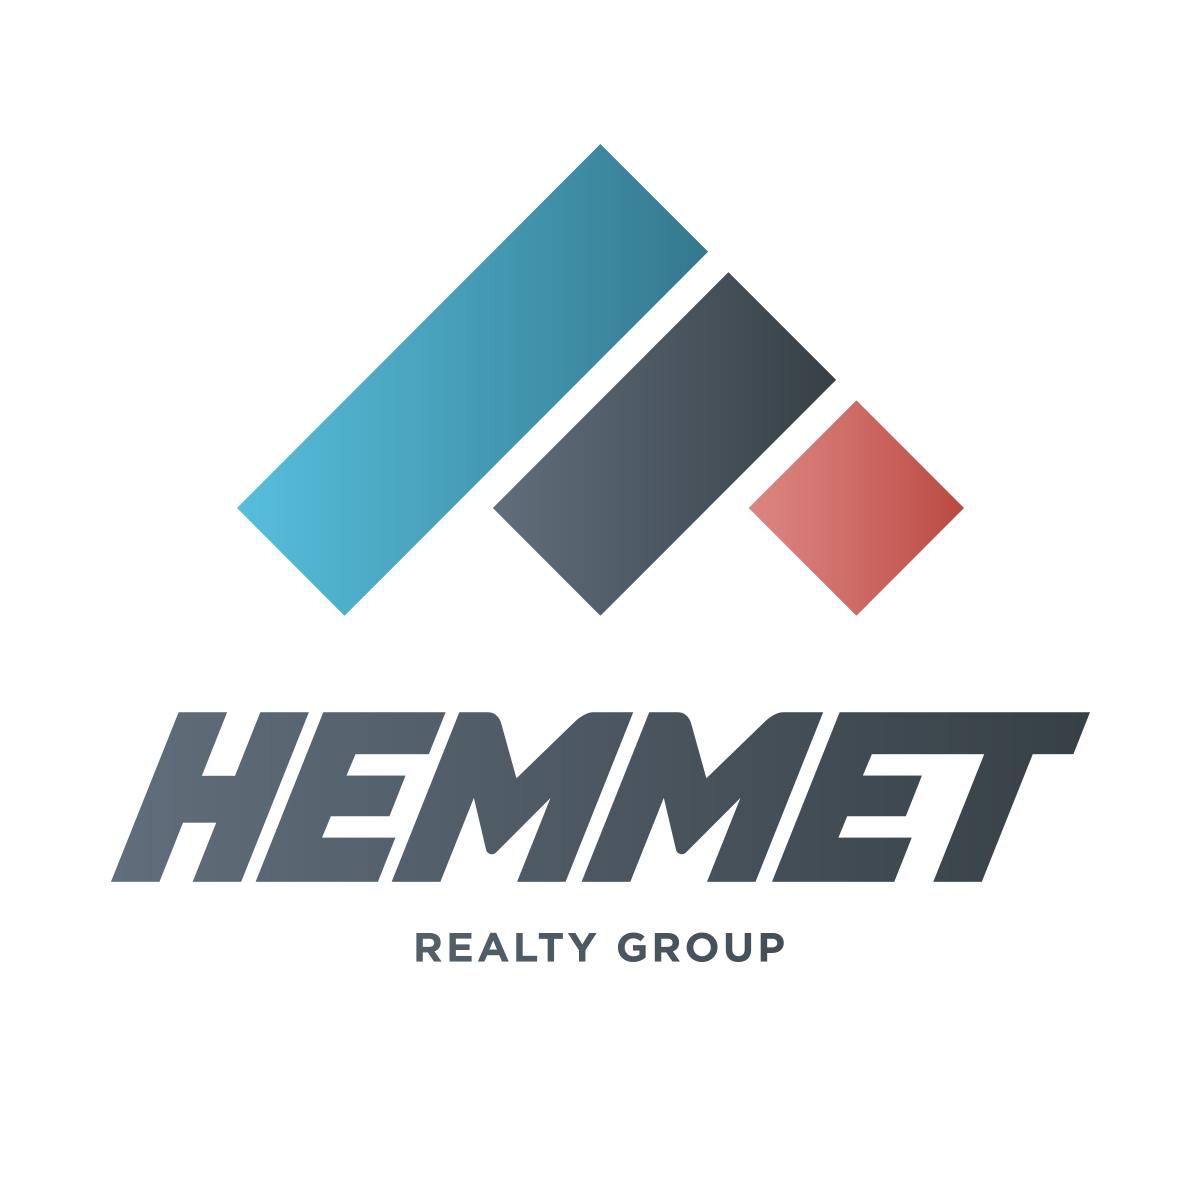 Hemmet_-_Instagram_Profile_Pic_2.jpg